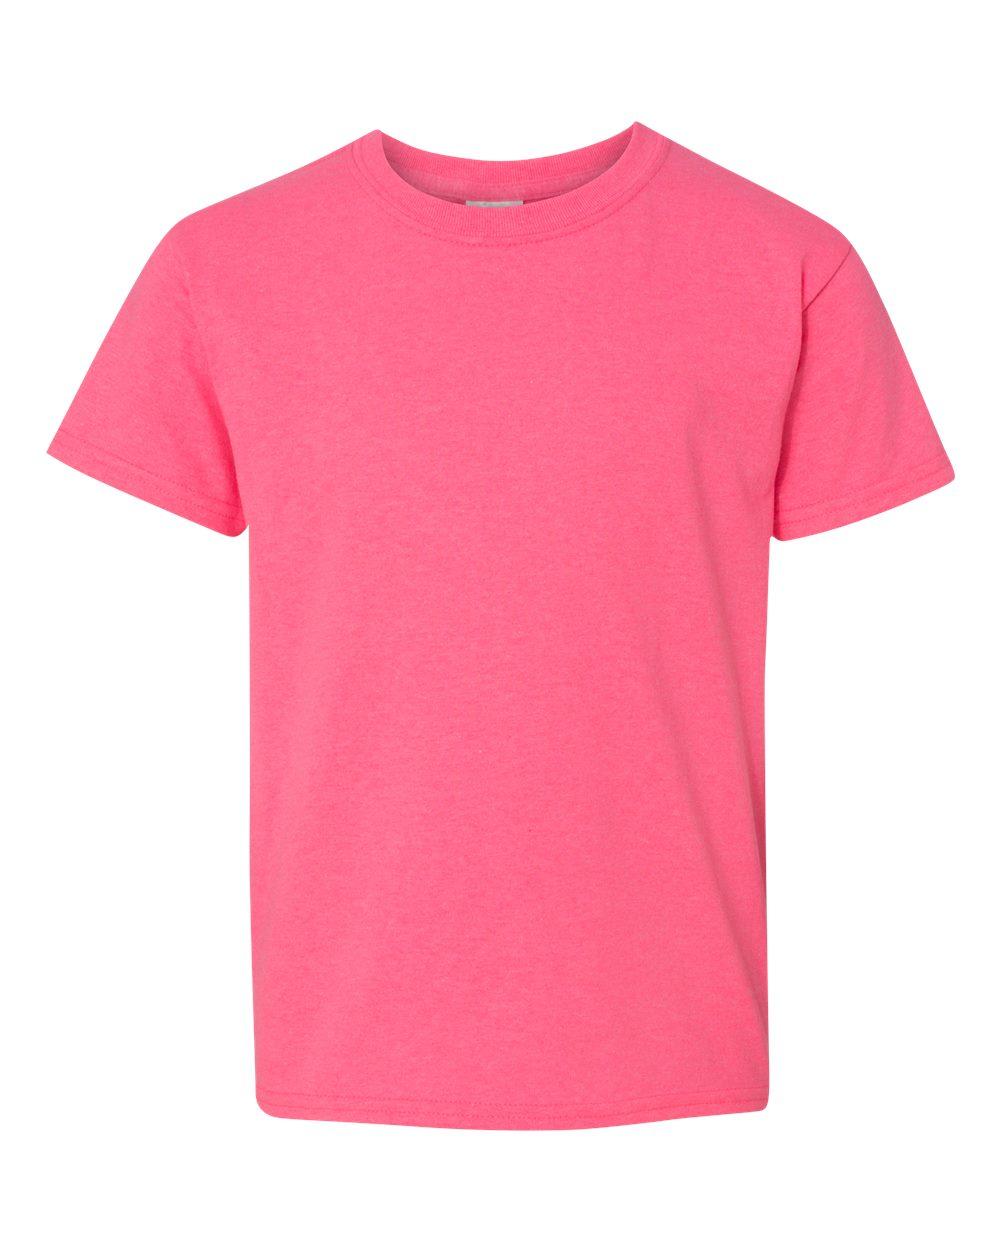 5000b Gildan Heavyweight Cotton Youth T Shirt Blank